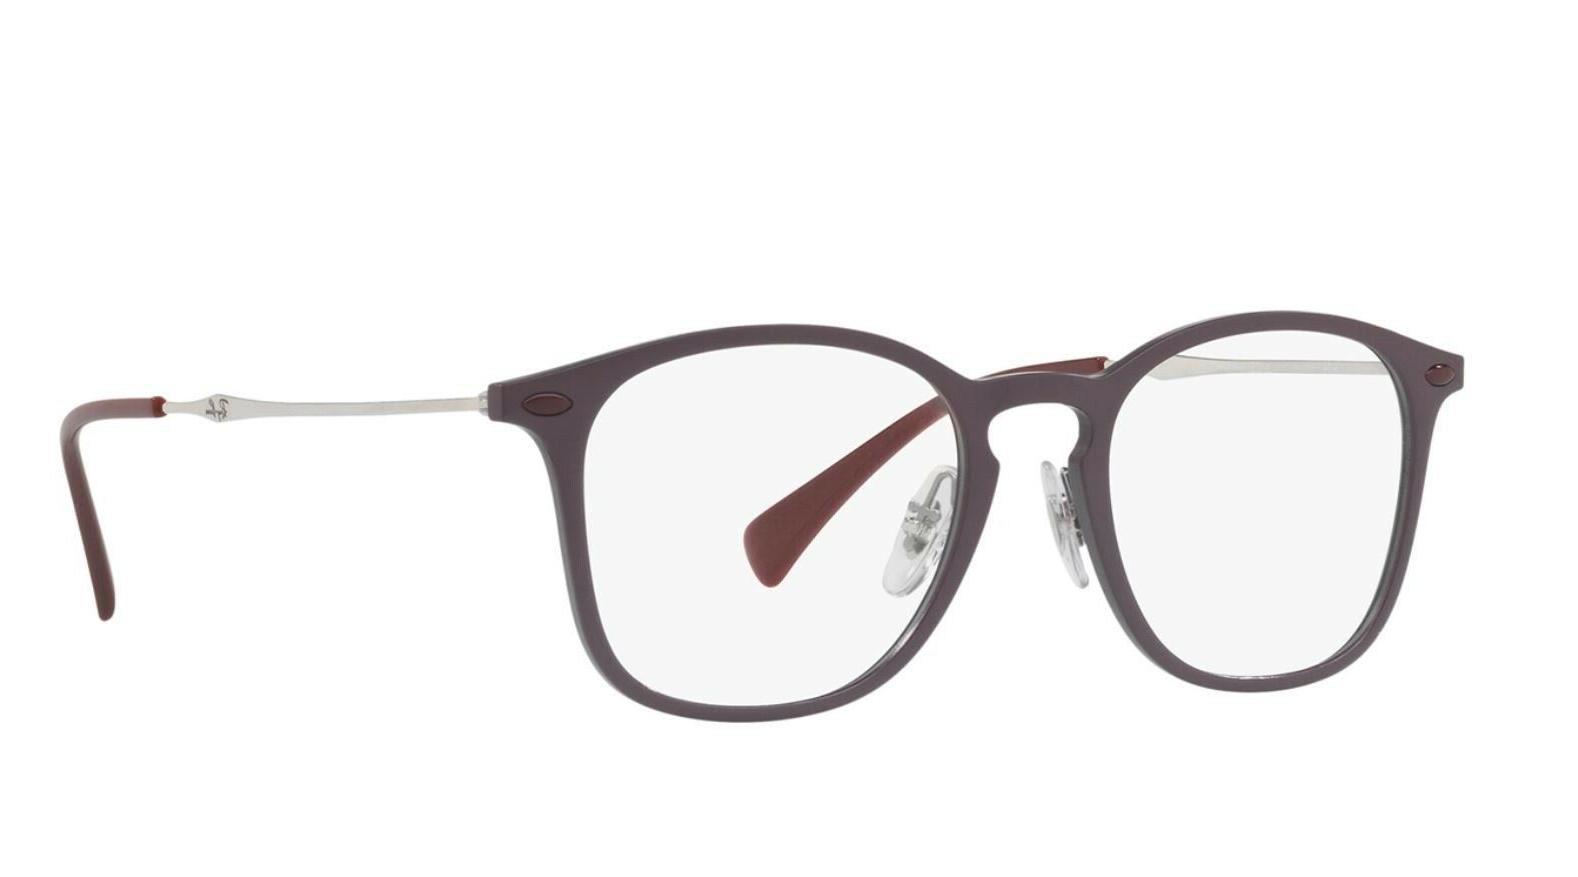 Ray-Ban RB 8954 8031 Graphene Eyeglasses Optical Frames